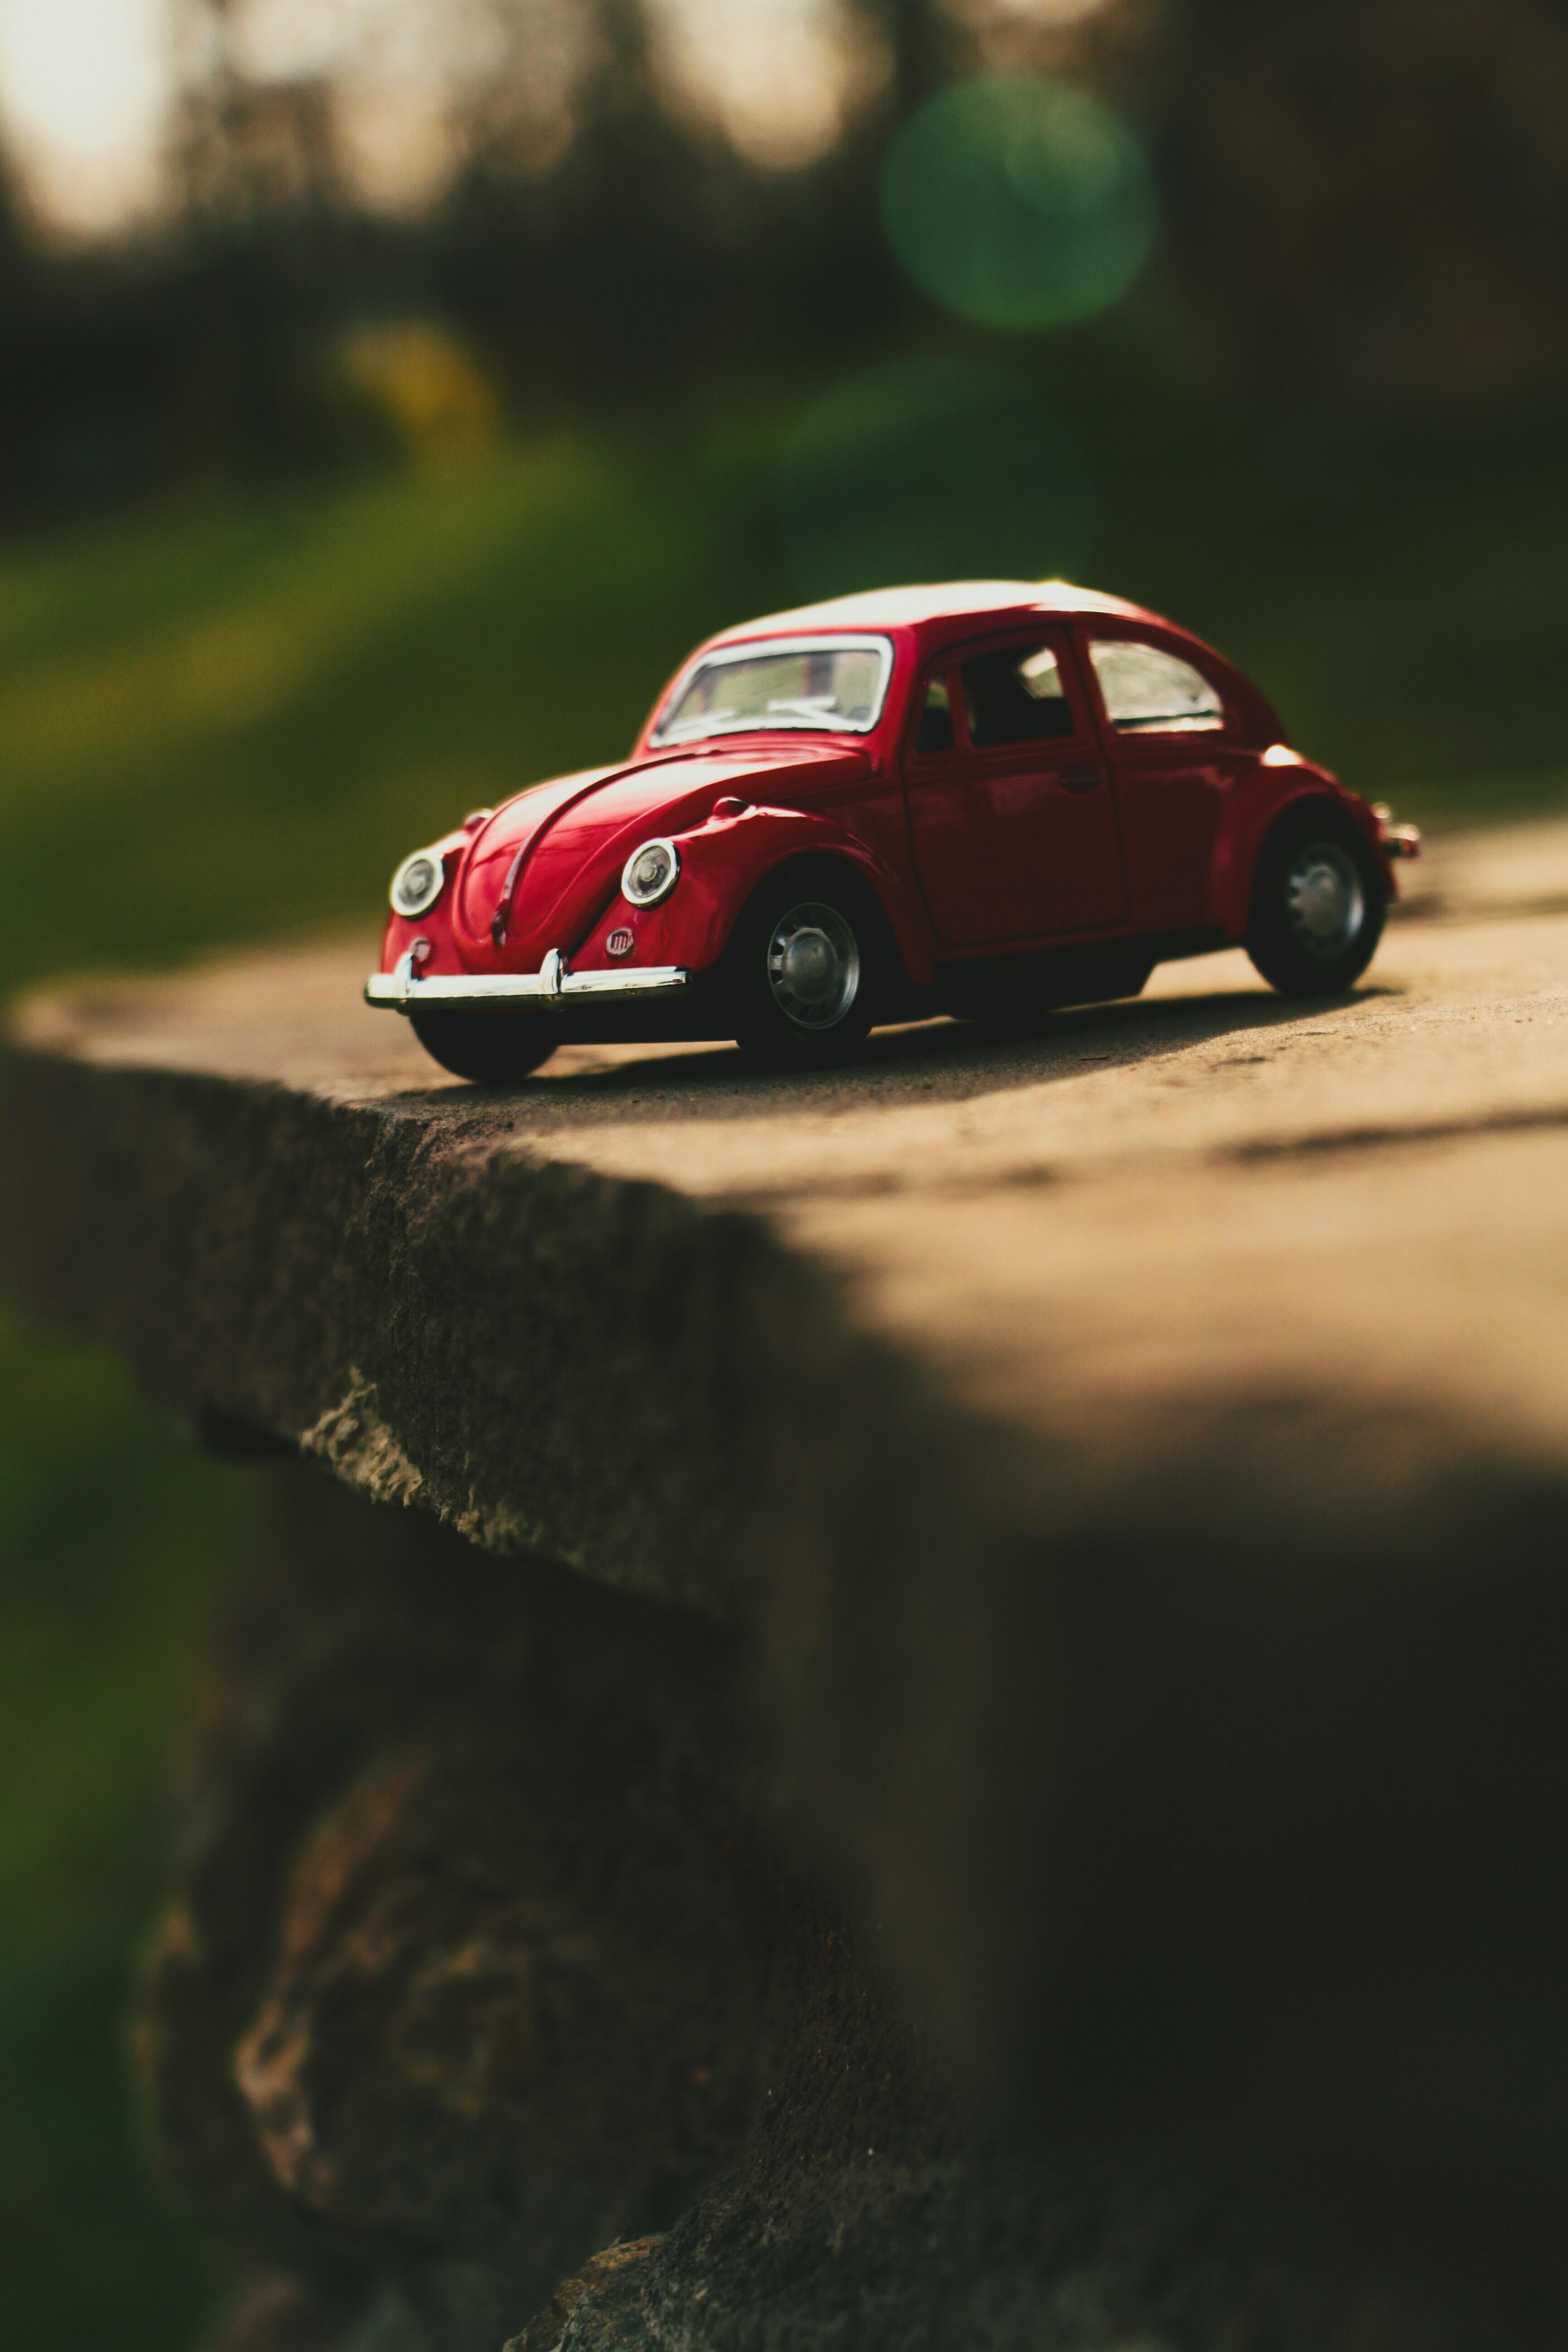 Volkswagen beetle toy on the table in Tehran.